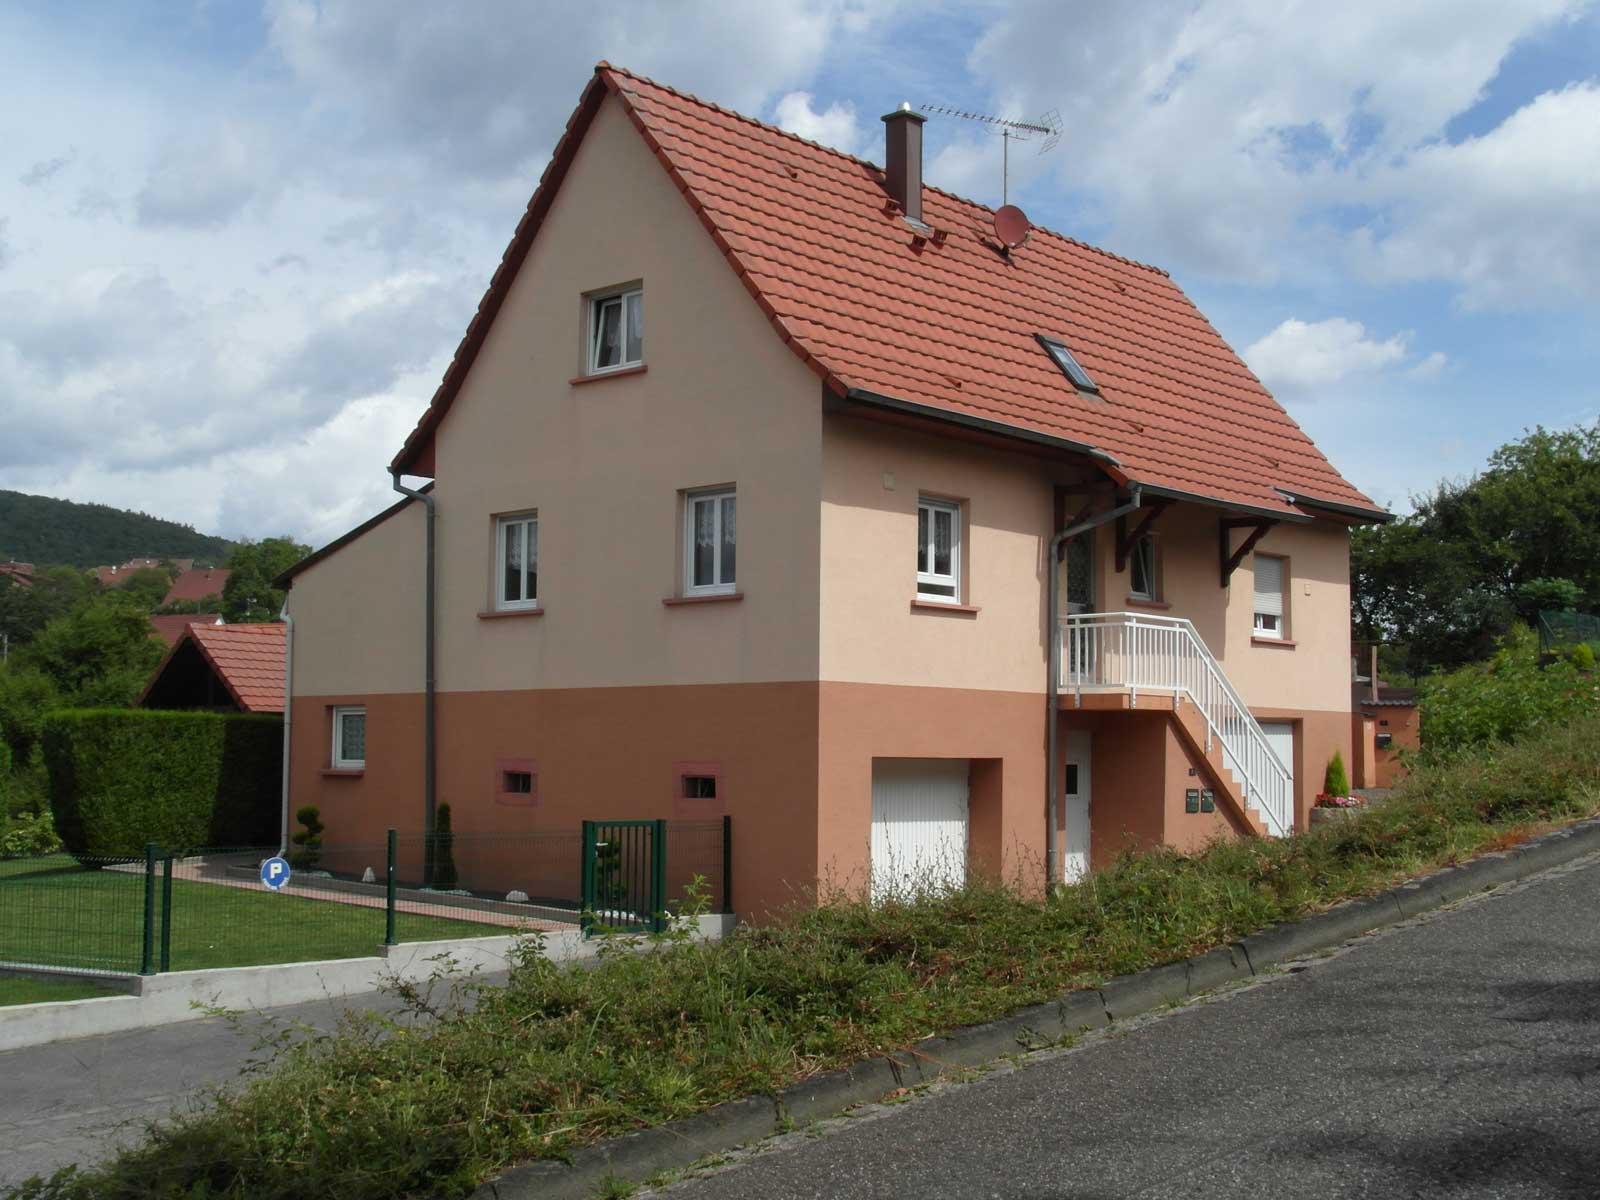 Meublé de M. Rickling, Niederbronn-les-Bains, Alsace